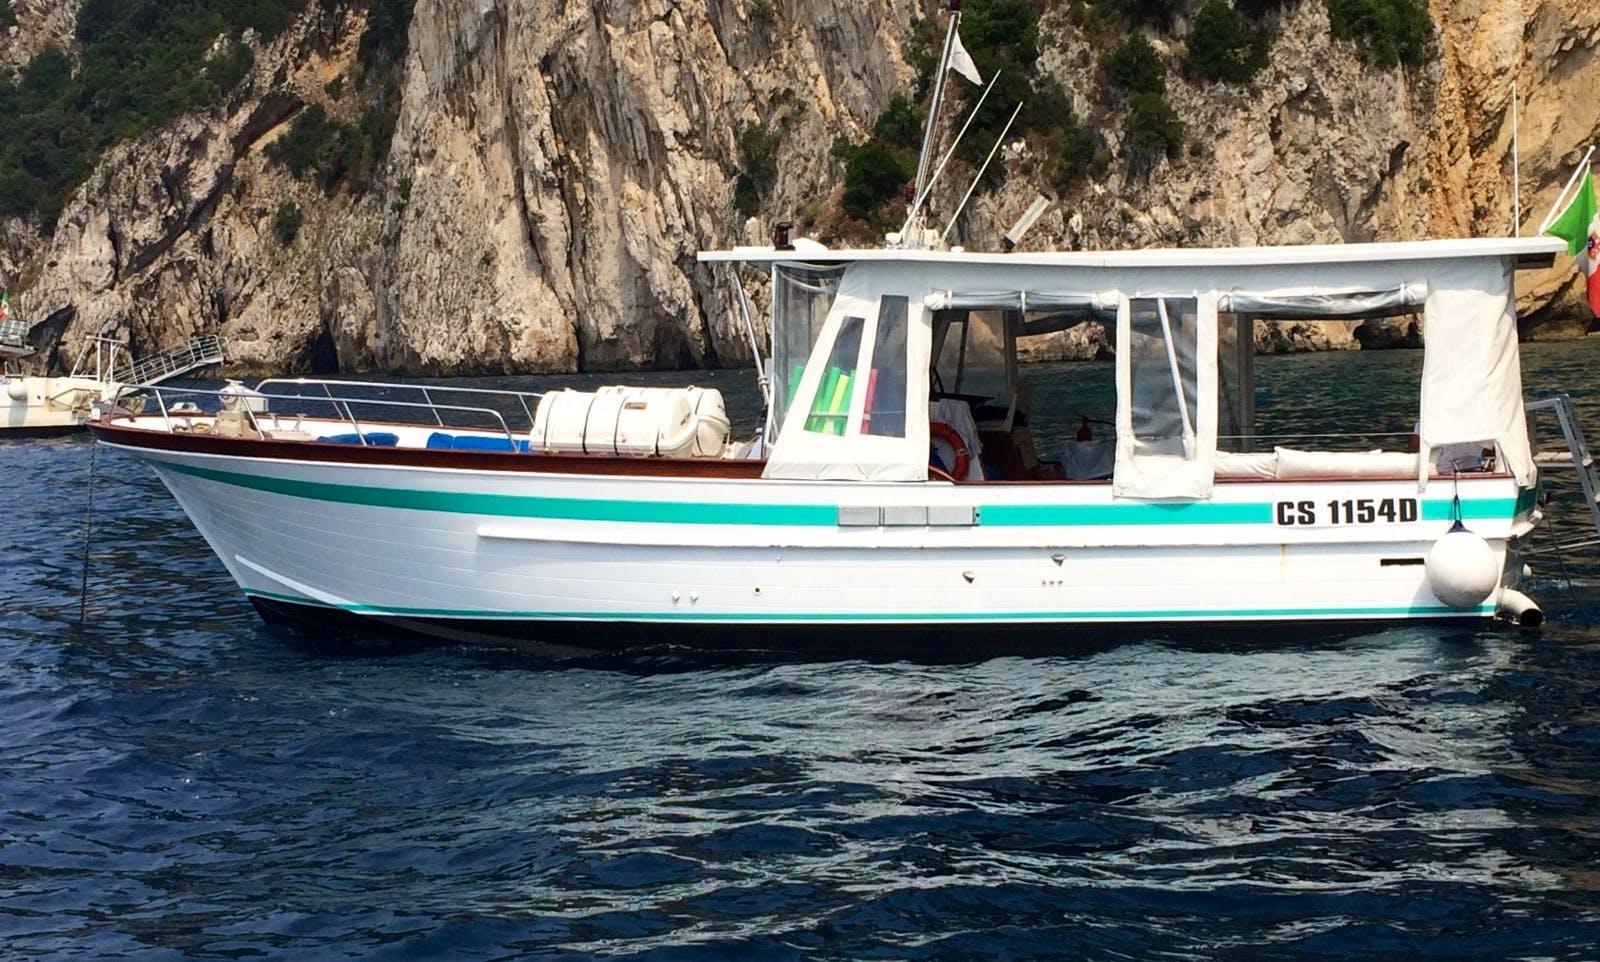 Remarkable Boat Trip Around Amalfi Coast Aboard 44' Motor Yacht